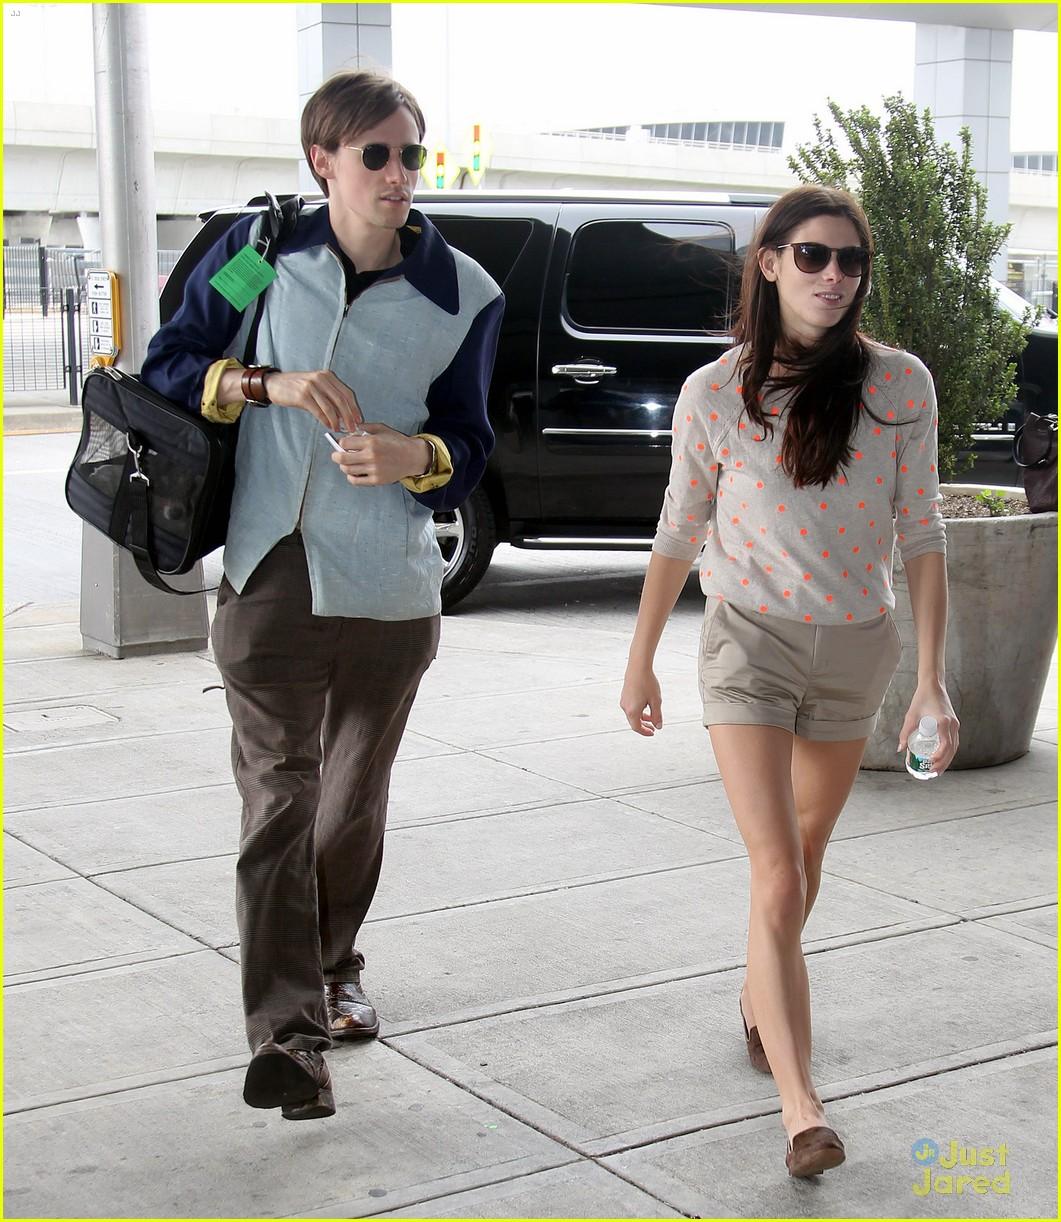 http://1.bp.blogspot.com/--Gmkc-wpDRs/T9yZC0TiiEI/AAAAAAAAUMU/44D25Q5HgnI/s1600/Ashley+Greene+Boyfriend-5.jpg